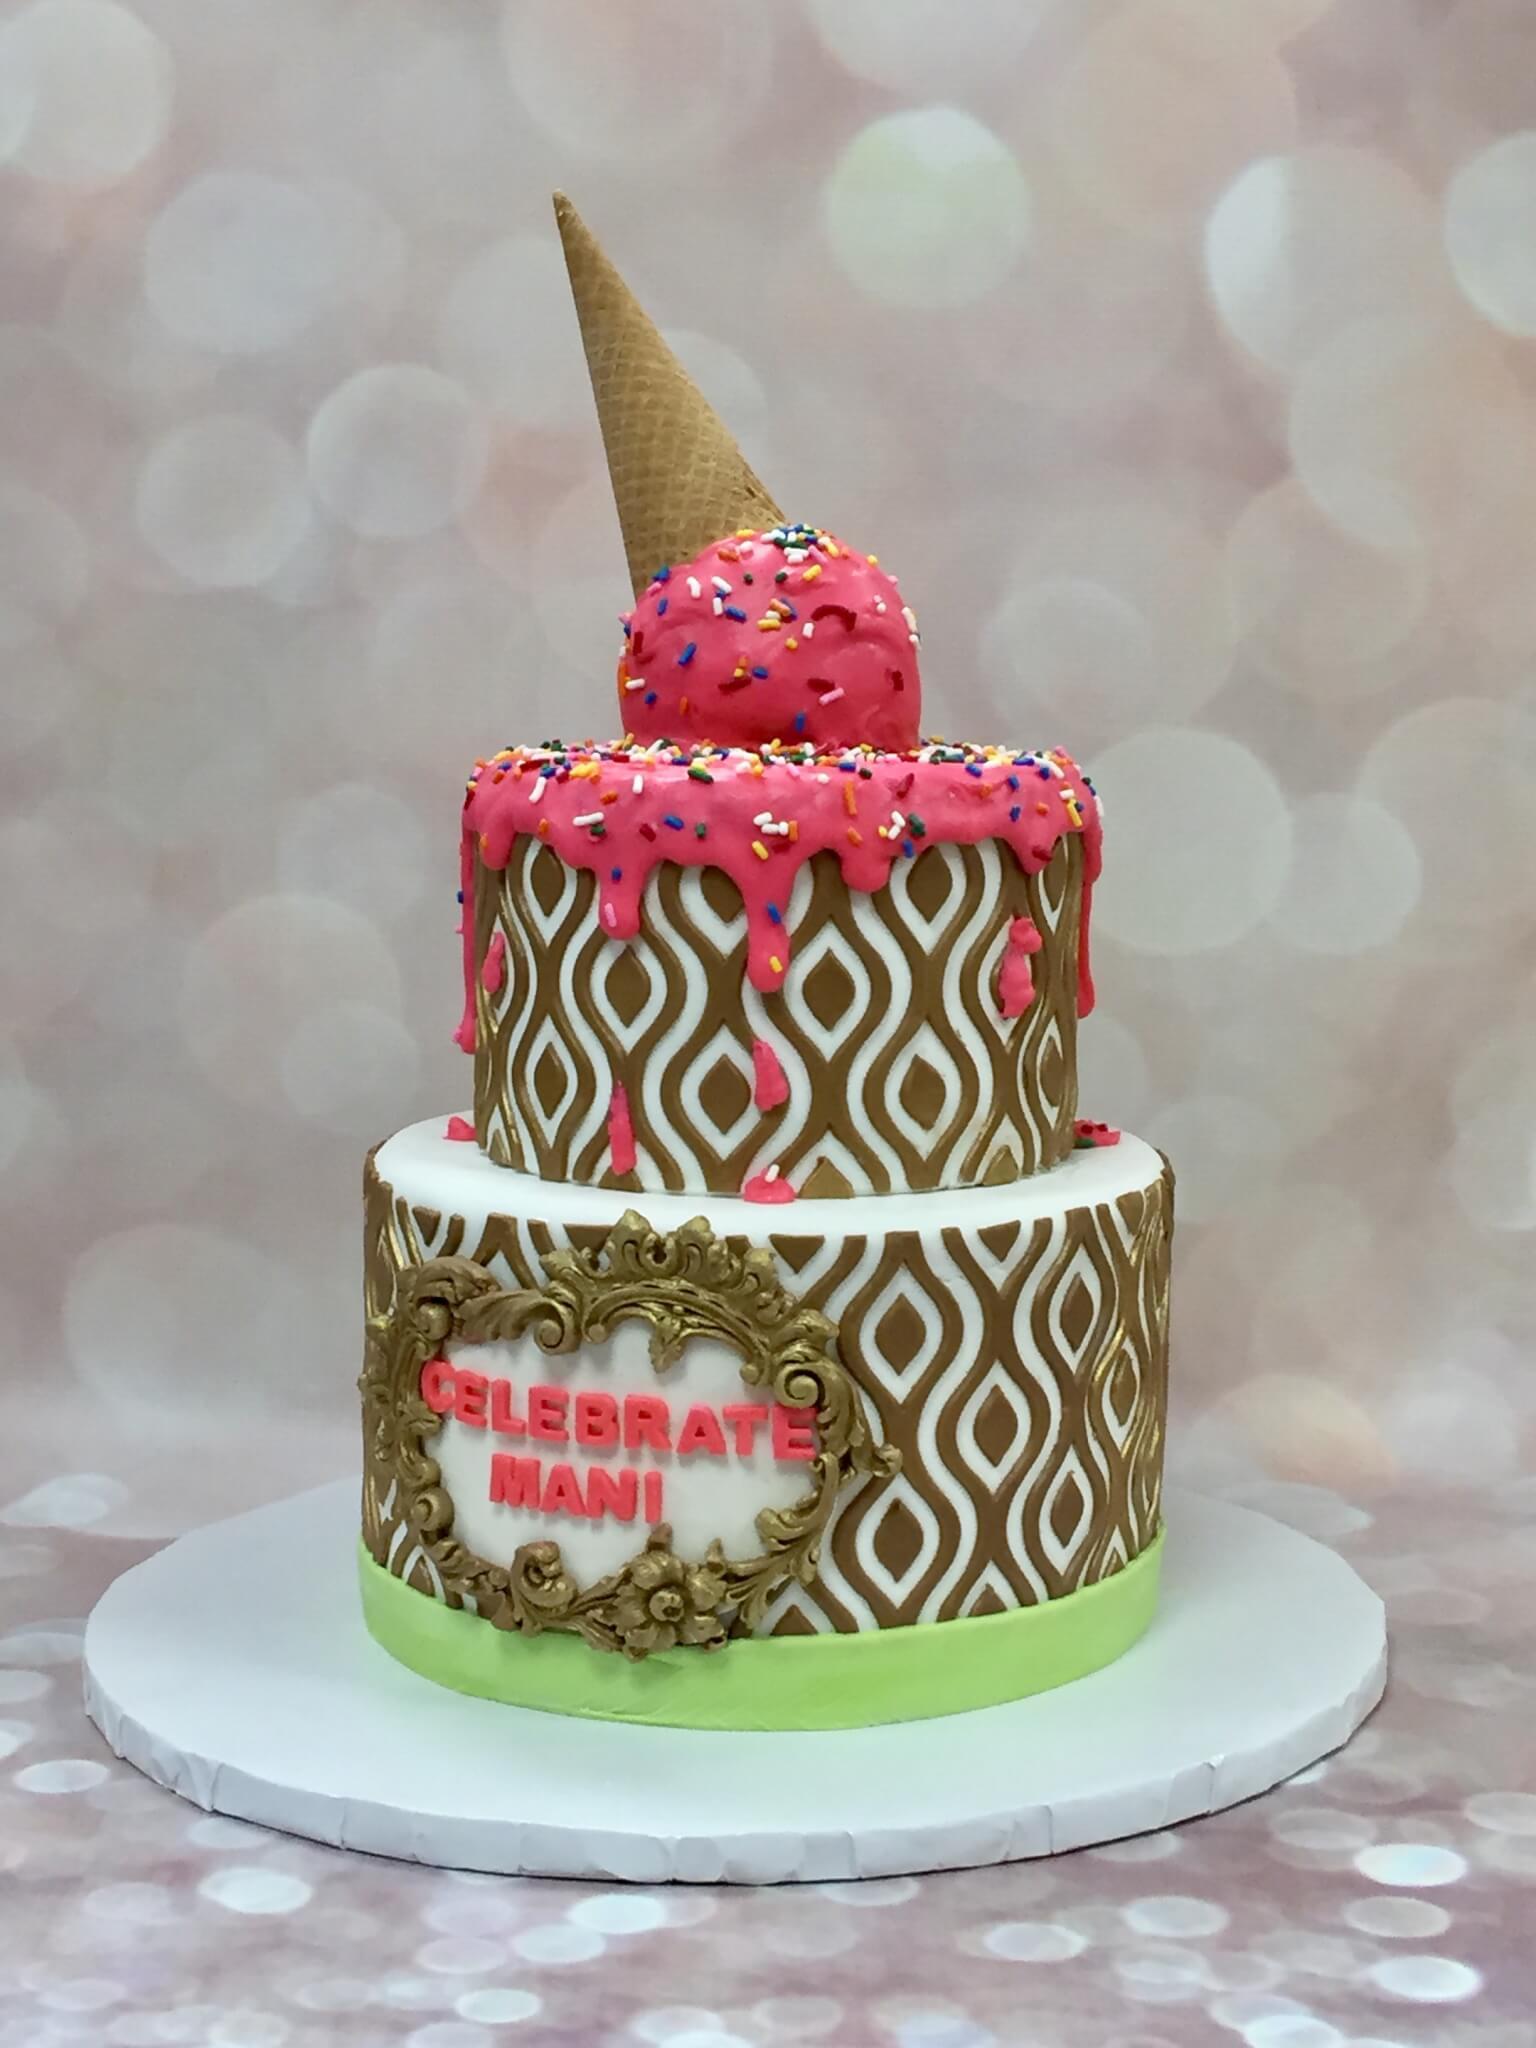 Birthday Cakes Diane Michelle Cakes